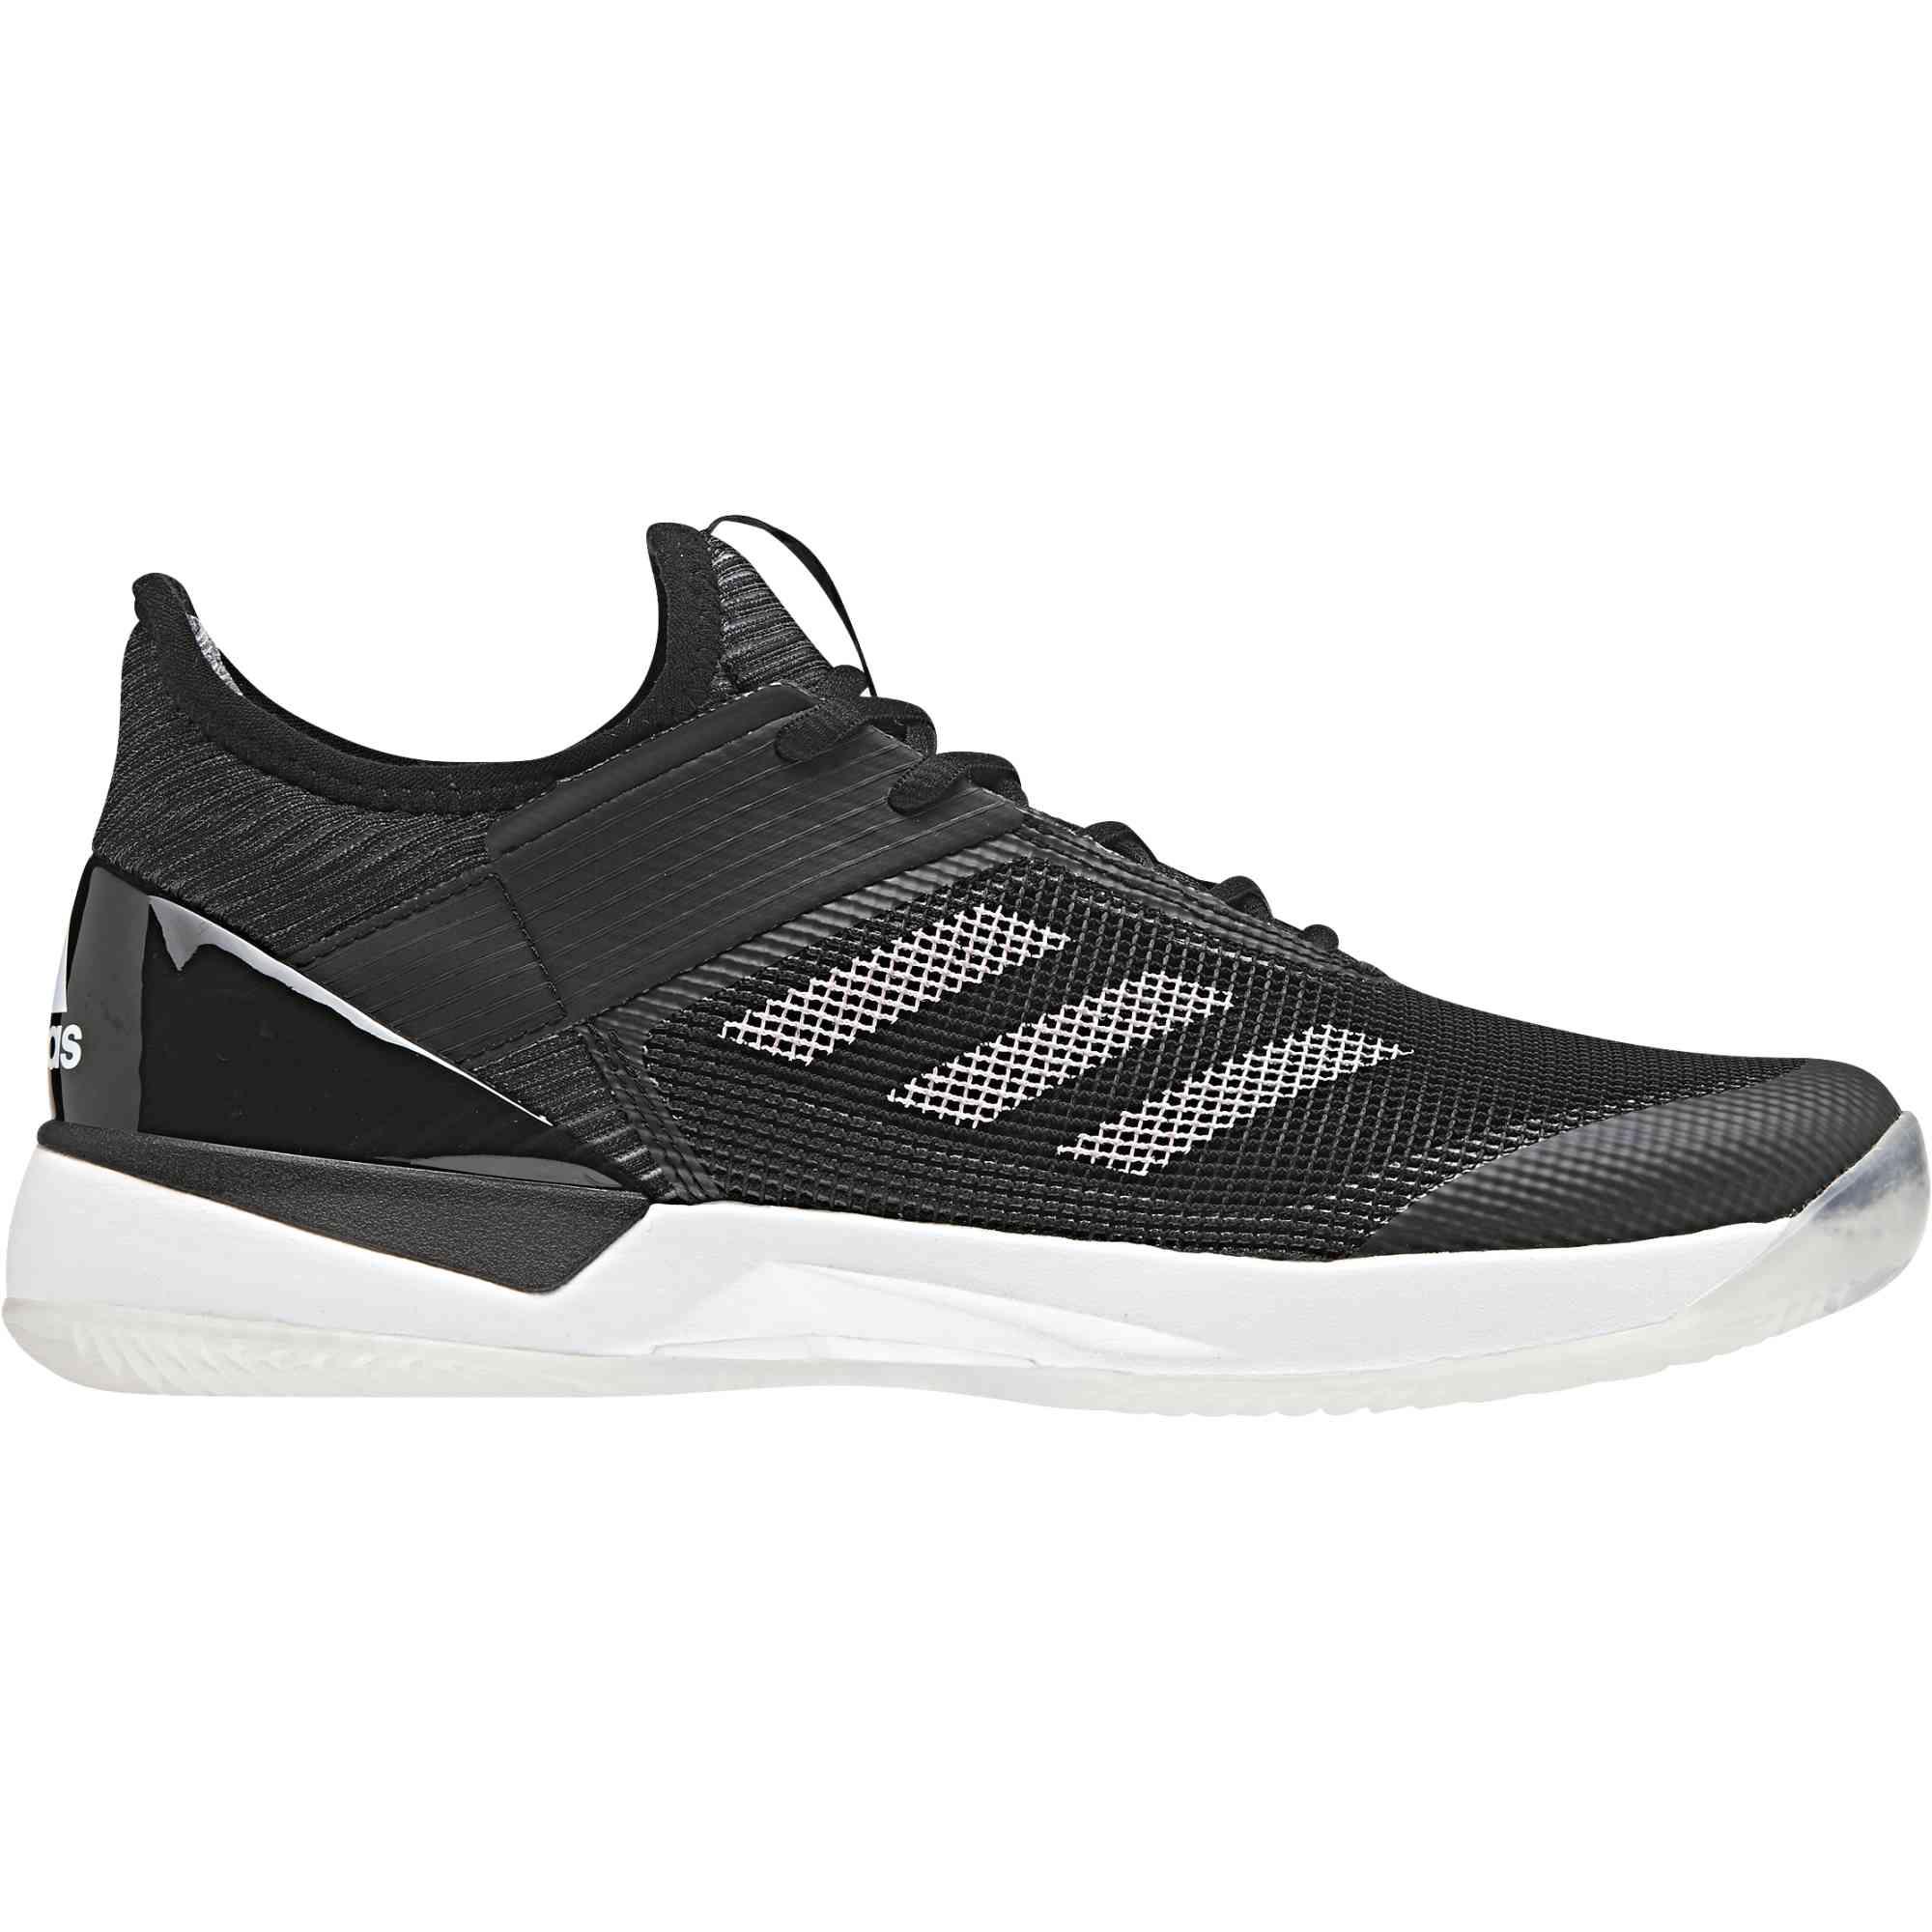 Adidas Ubersonic 3 Clay Dames tennisschoenen